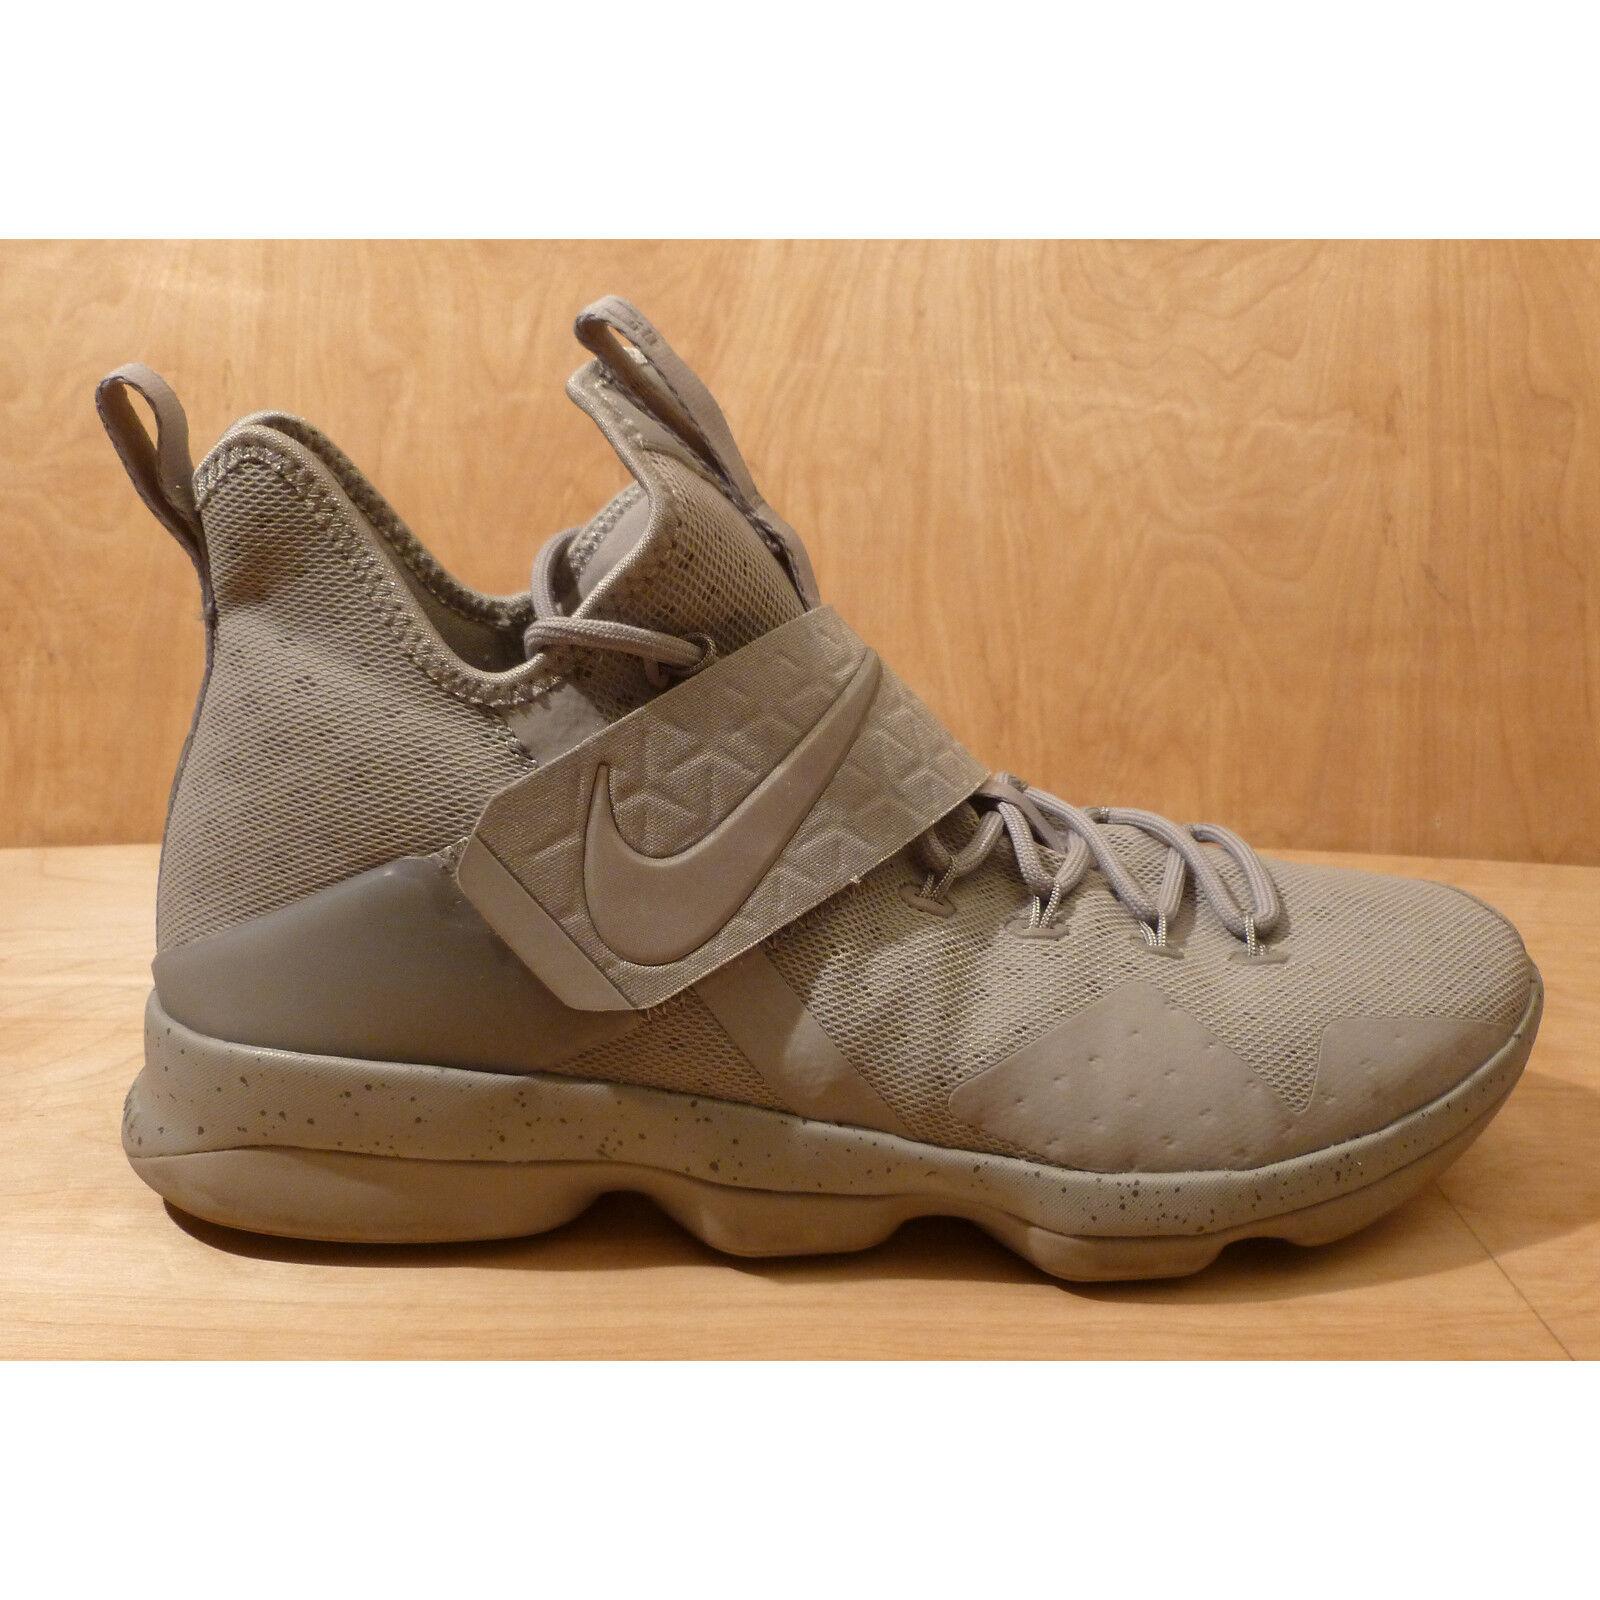 524c551d6a02 NIKE Lebron XIV Silver Reflect 852405-007 Basketball Shoes Mens Size Size  Size 13 5d983c